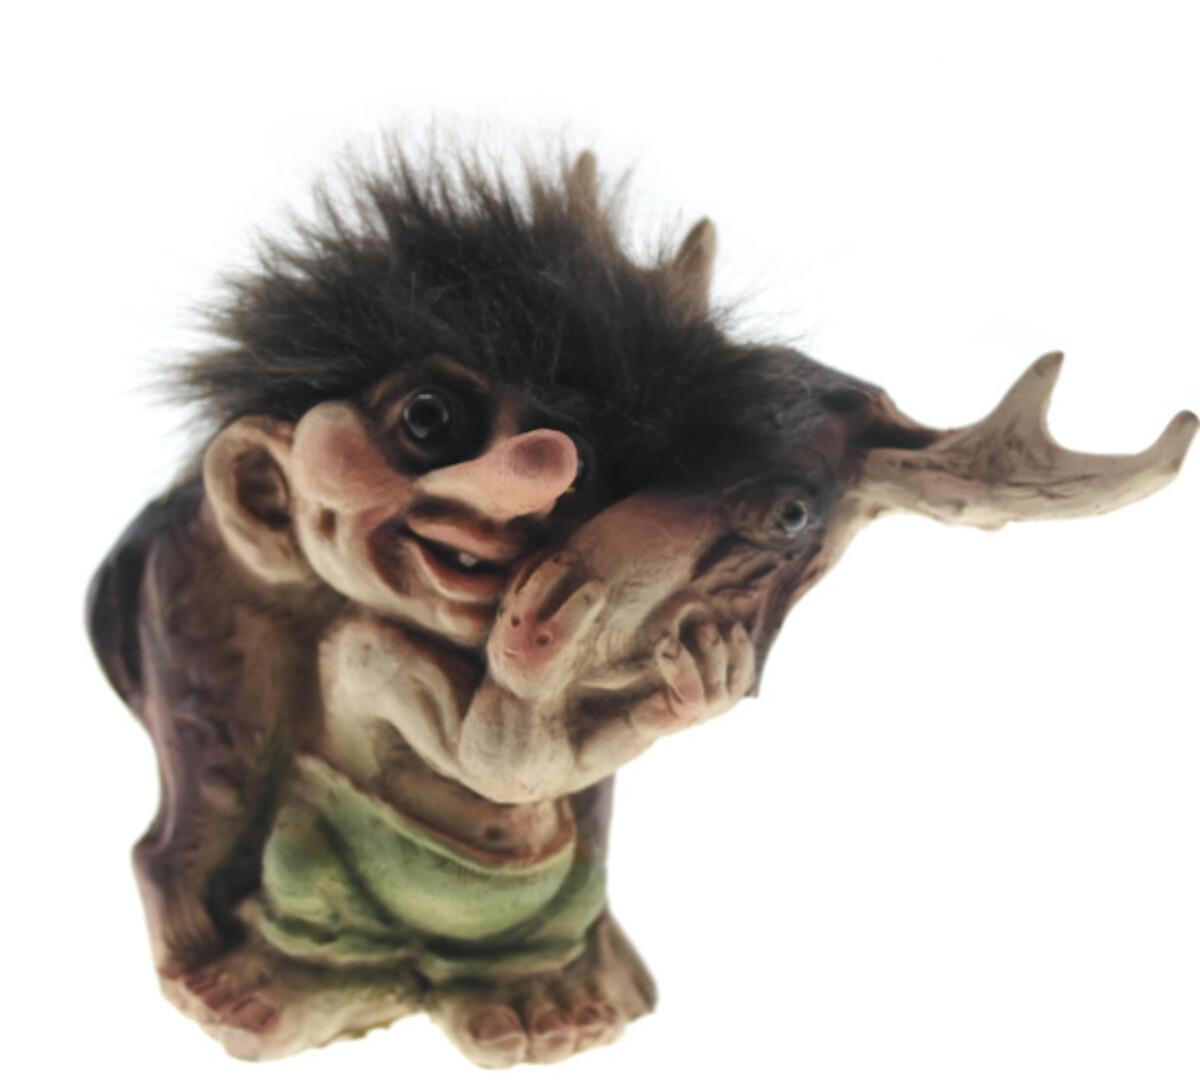 Troll with moose (Troll # 043)